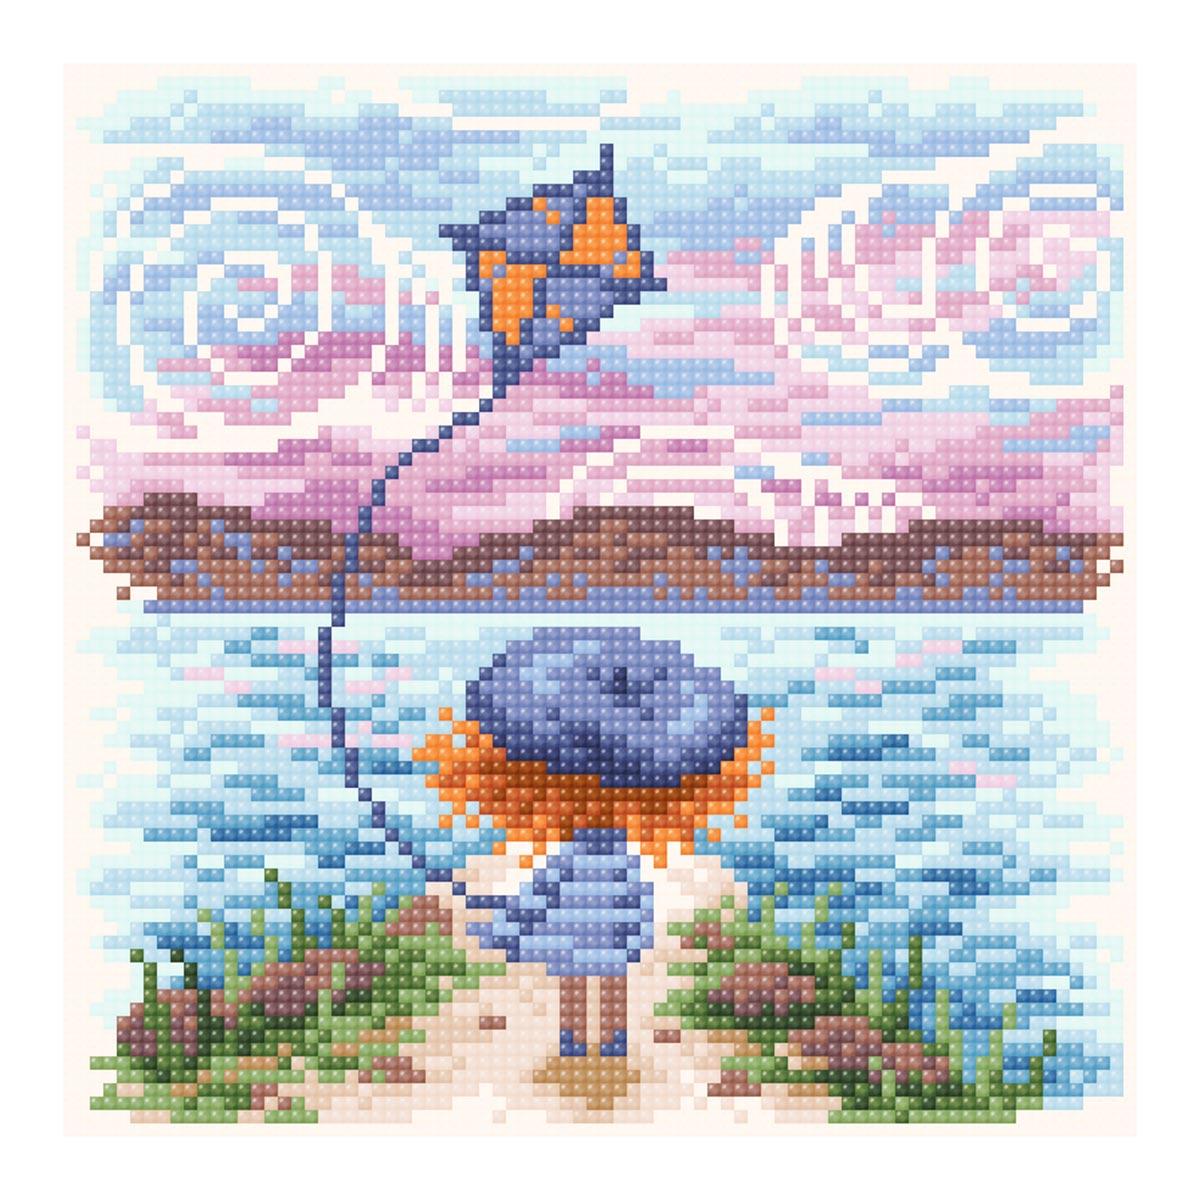 МС-076 Алмазная мозаика 'Мечты о море' 20*20 см Brilliart